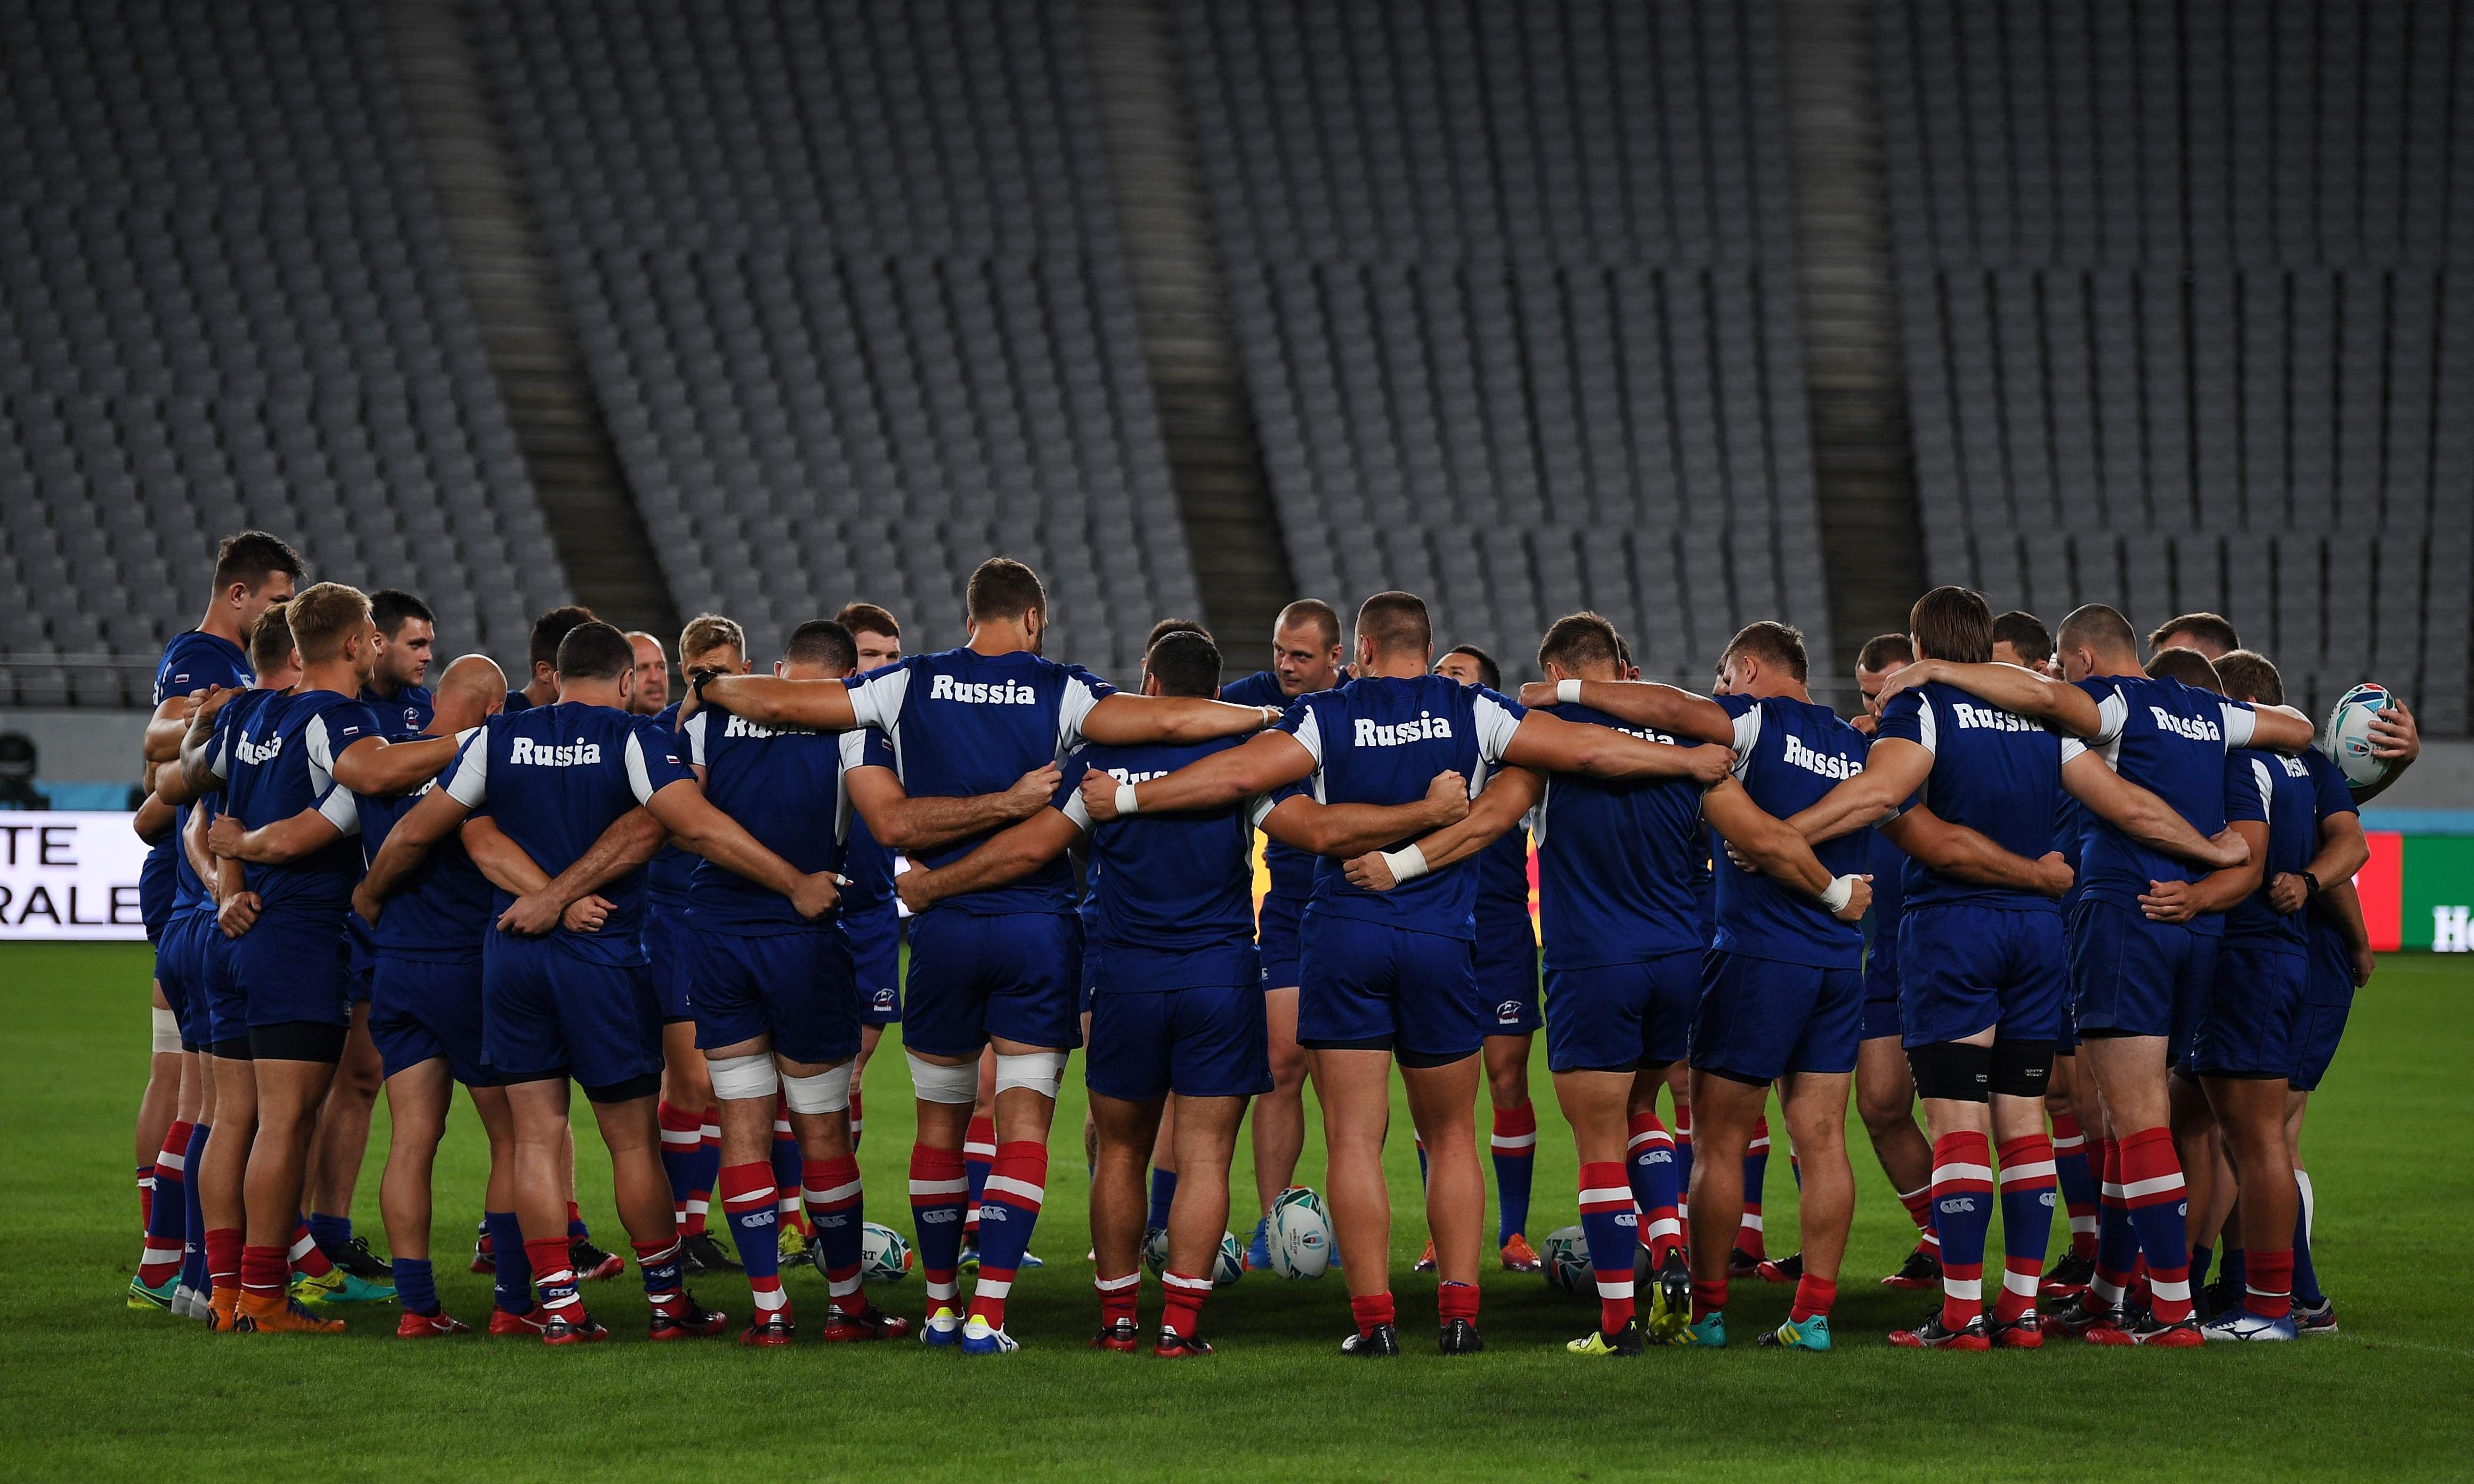 'The pressure is on Japan': Russia seek upset in Rugby World Cup opener